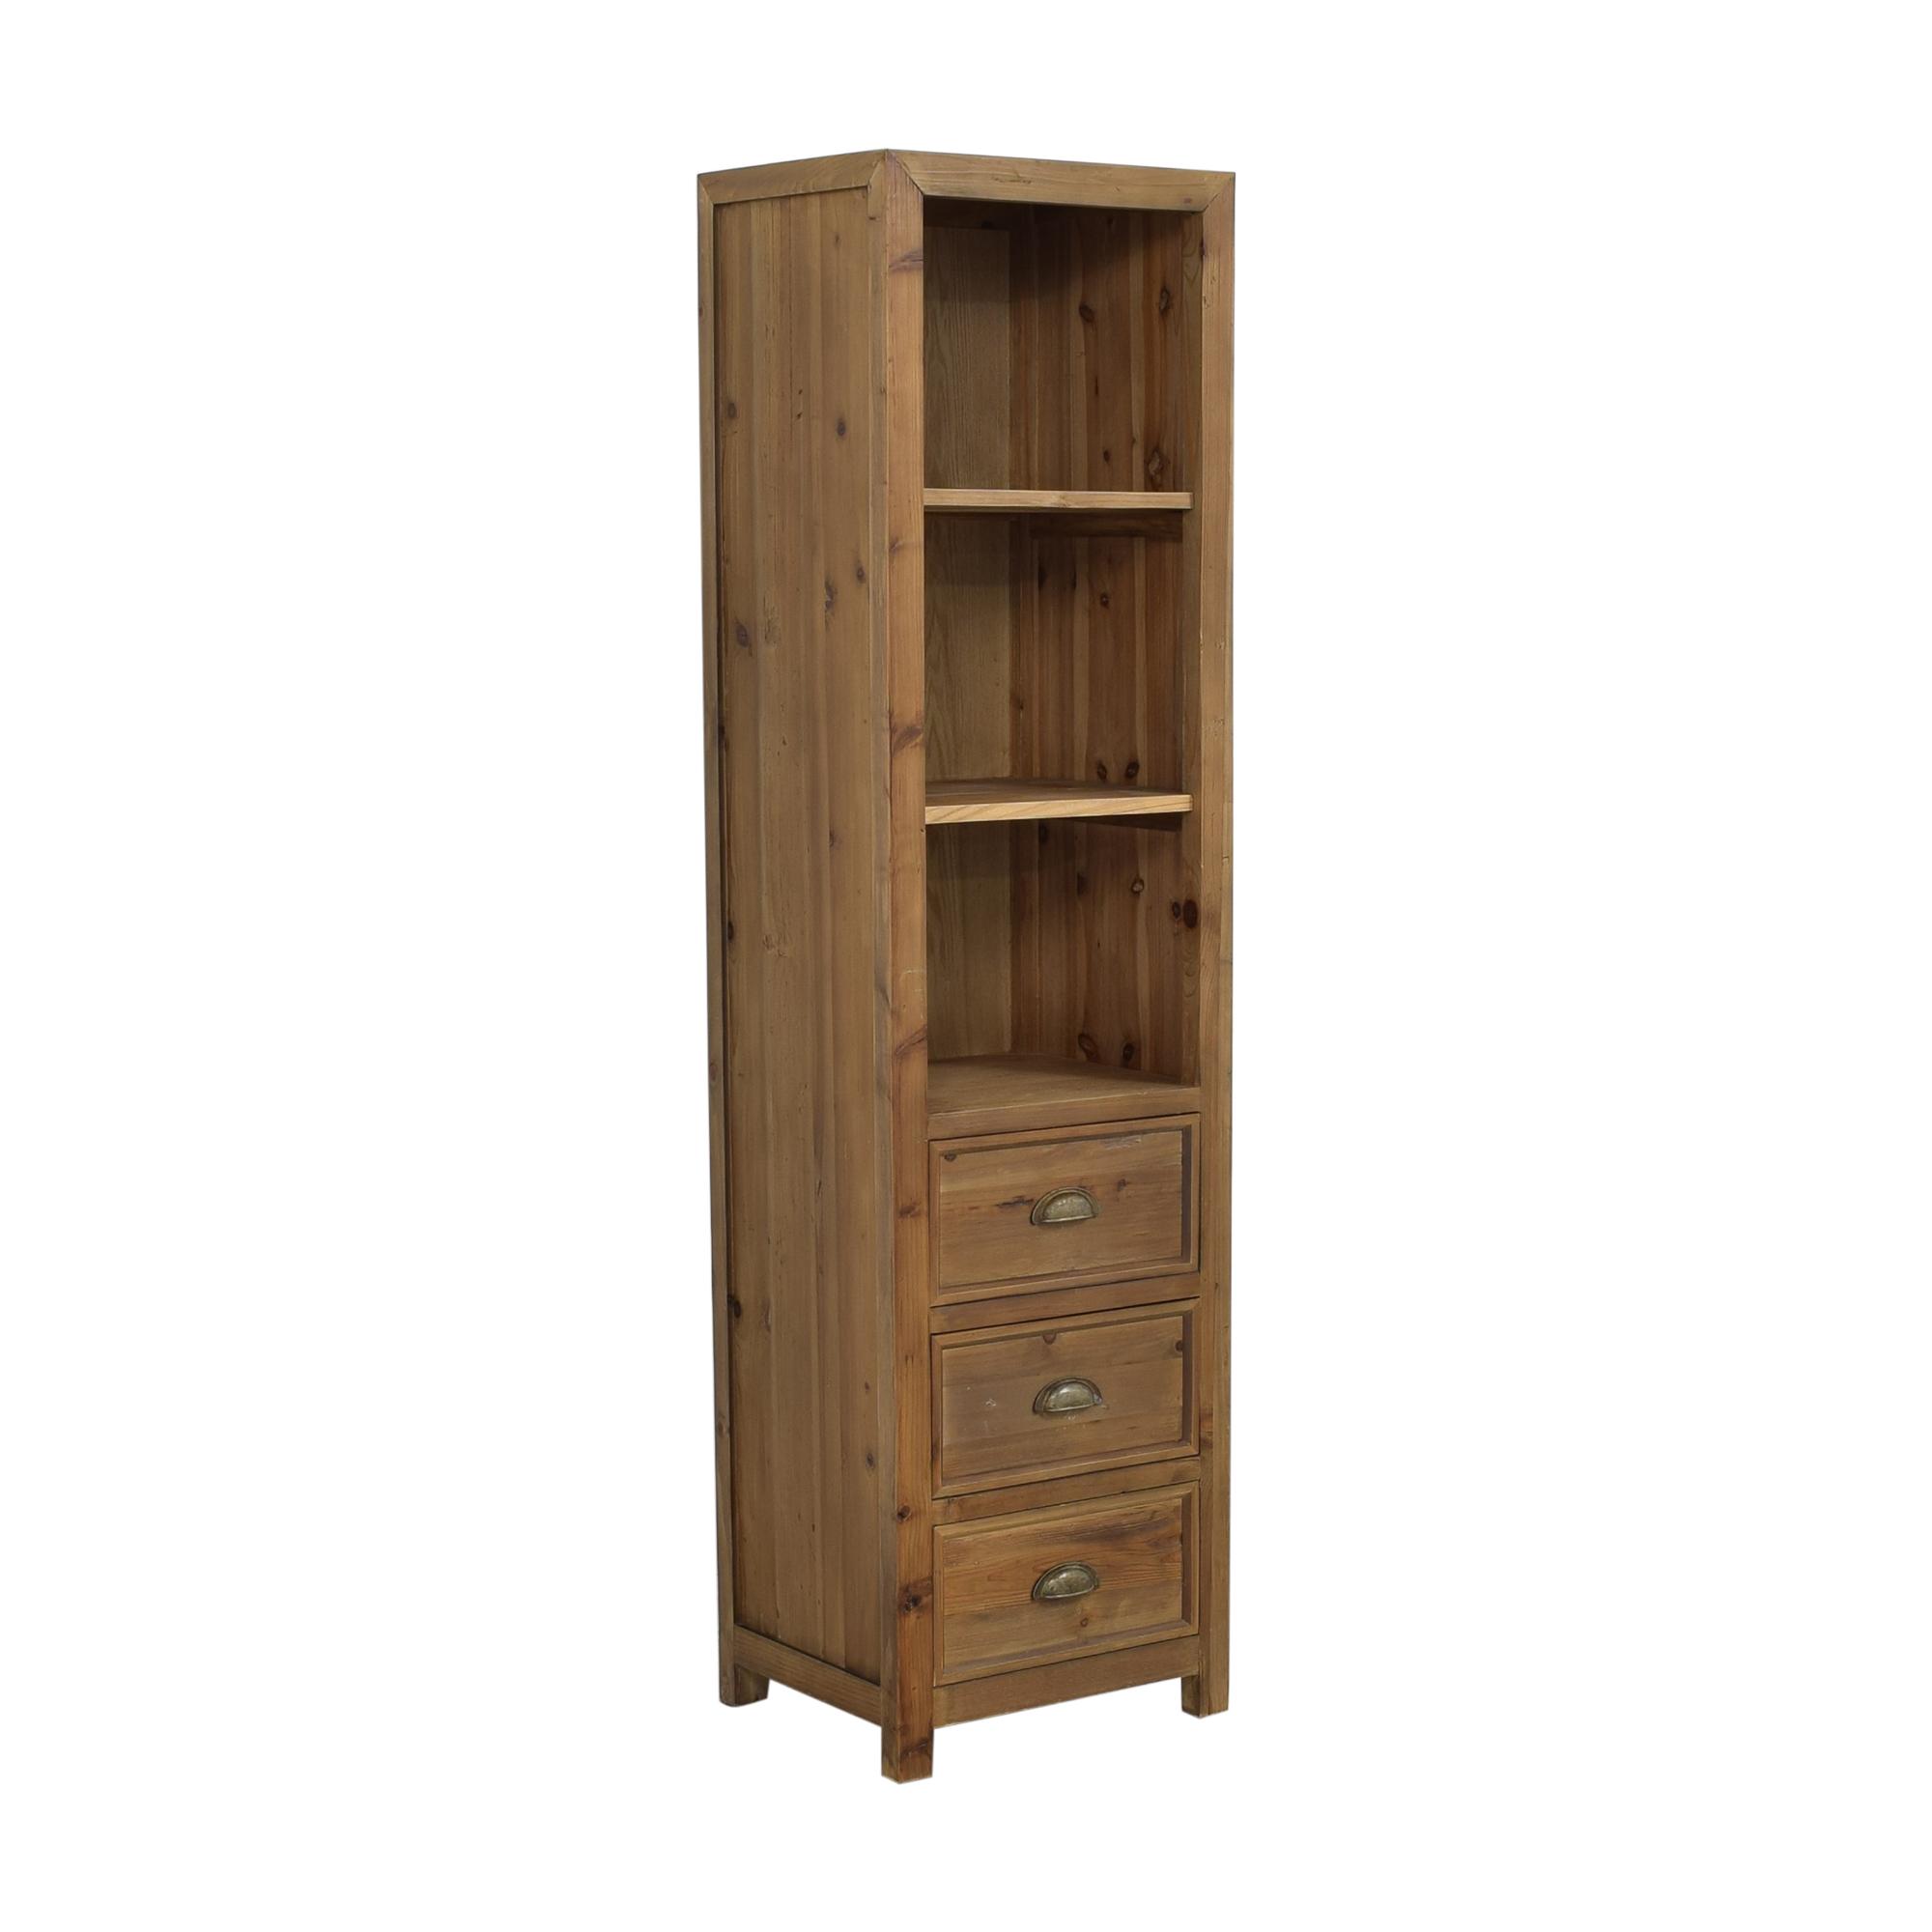 buy Stone & Beam Bryson Tall Narrow 3-Drawer Bookcase Stone & Beam